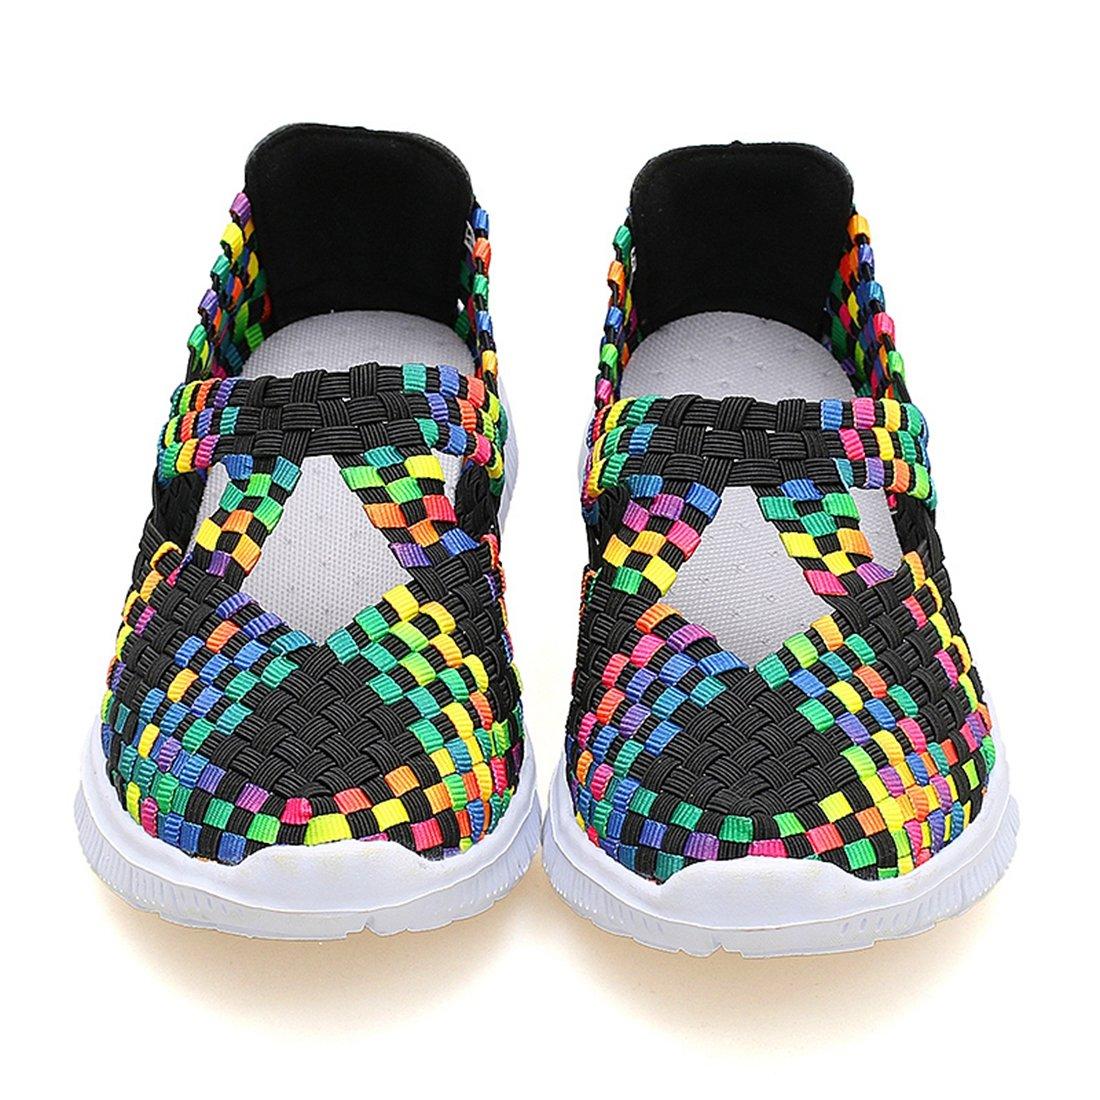 Amazon.com: dometool Mujeres Colorful Rocker único zapatos ...